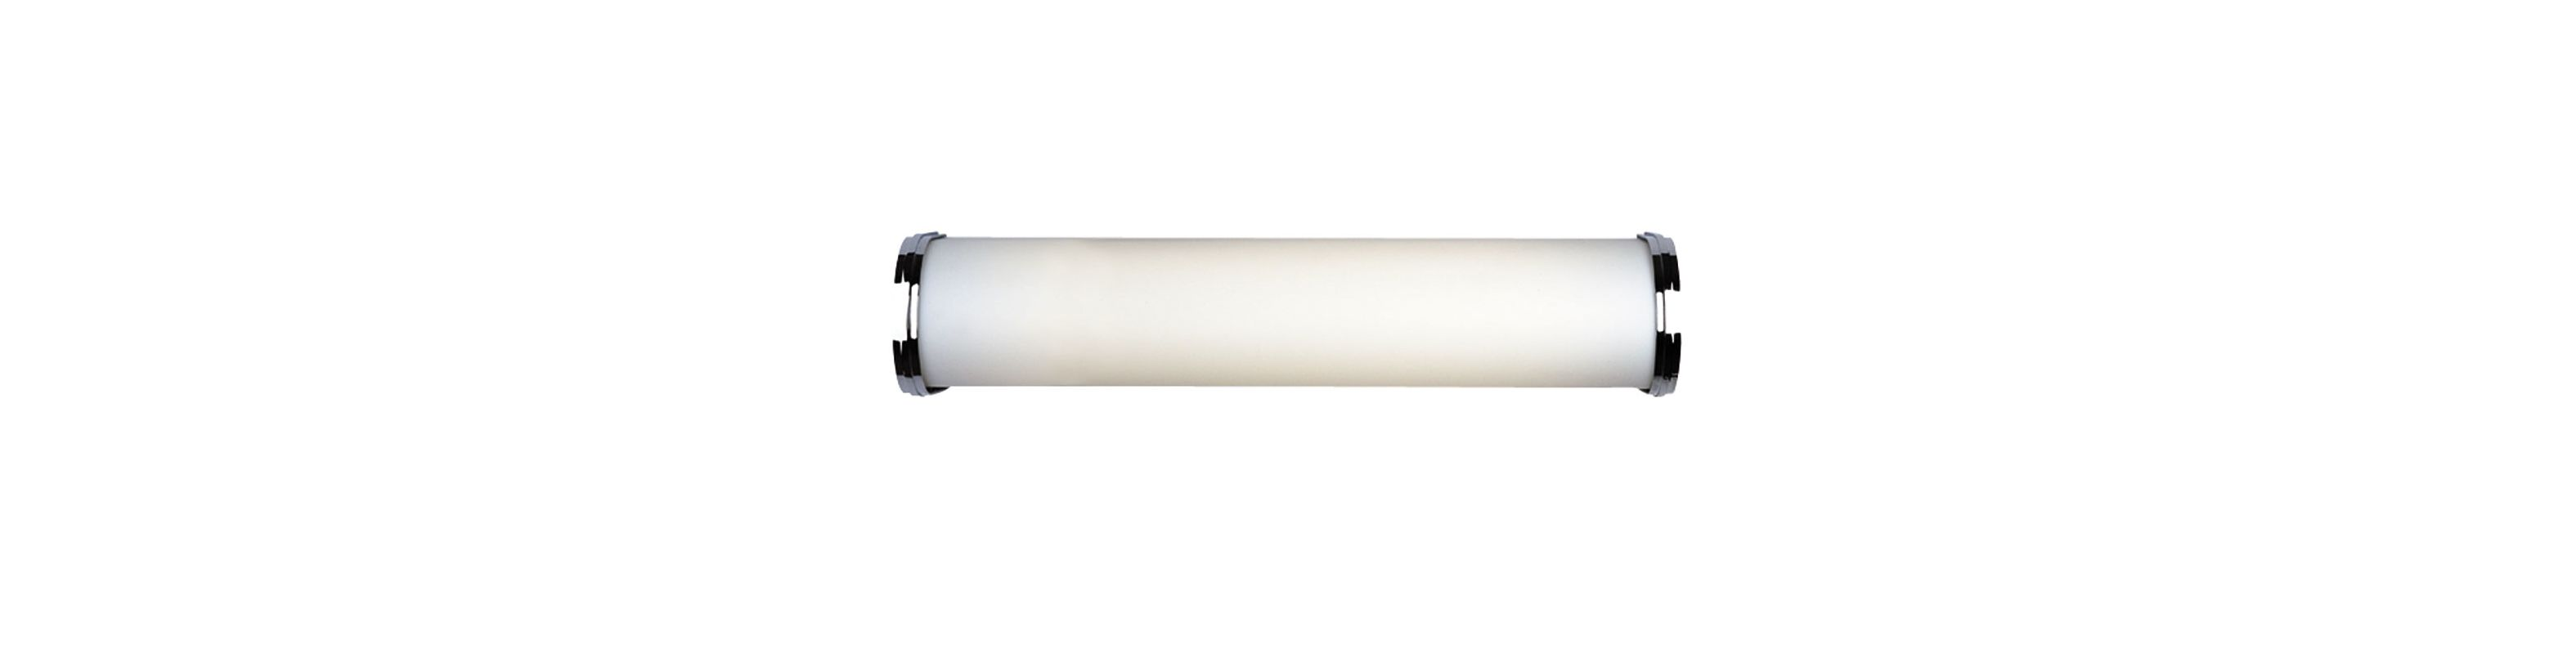 Philips F325336U Triple Bands 2 Light Bathroom Bath Bar Satin Nickel Sale $298.00 ITEM#: 2360529 MODEL# :F325336U UPC#: 742546045885 :